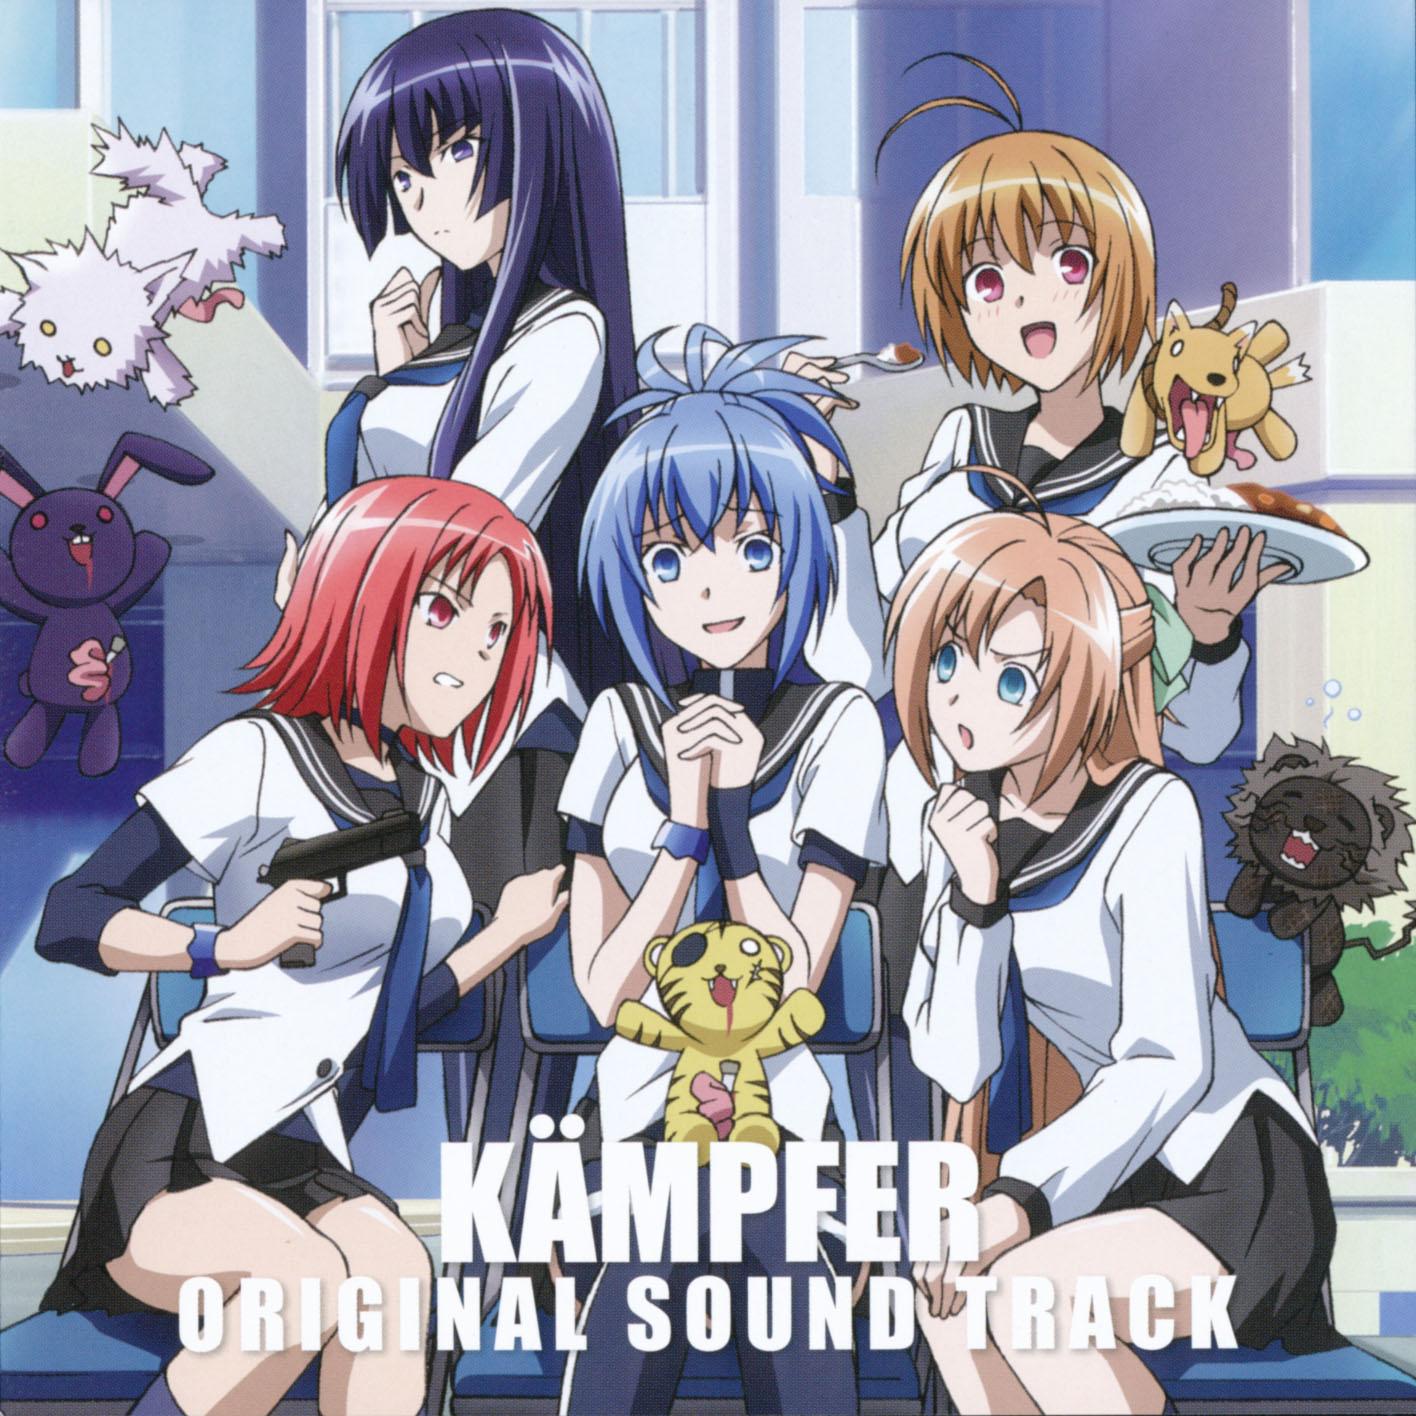 http://blog.animeinstrumentality.net/wp-content/uploads/2010/03/Kampfer-Original-Soundtrack-Cover.jpg